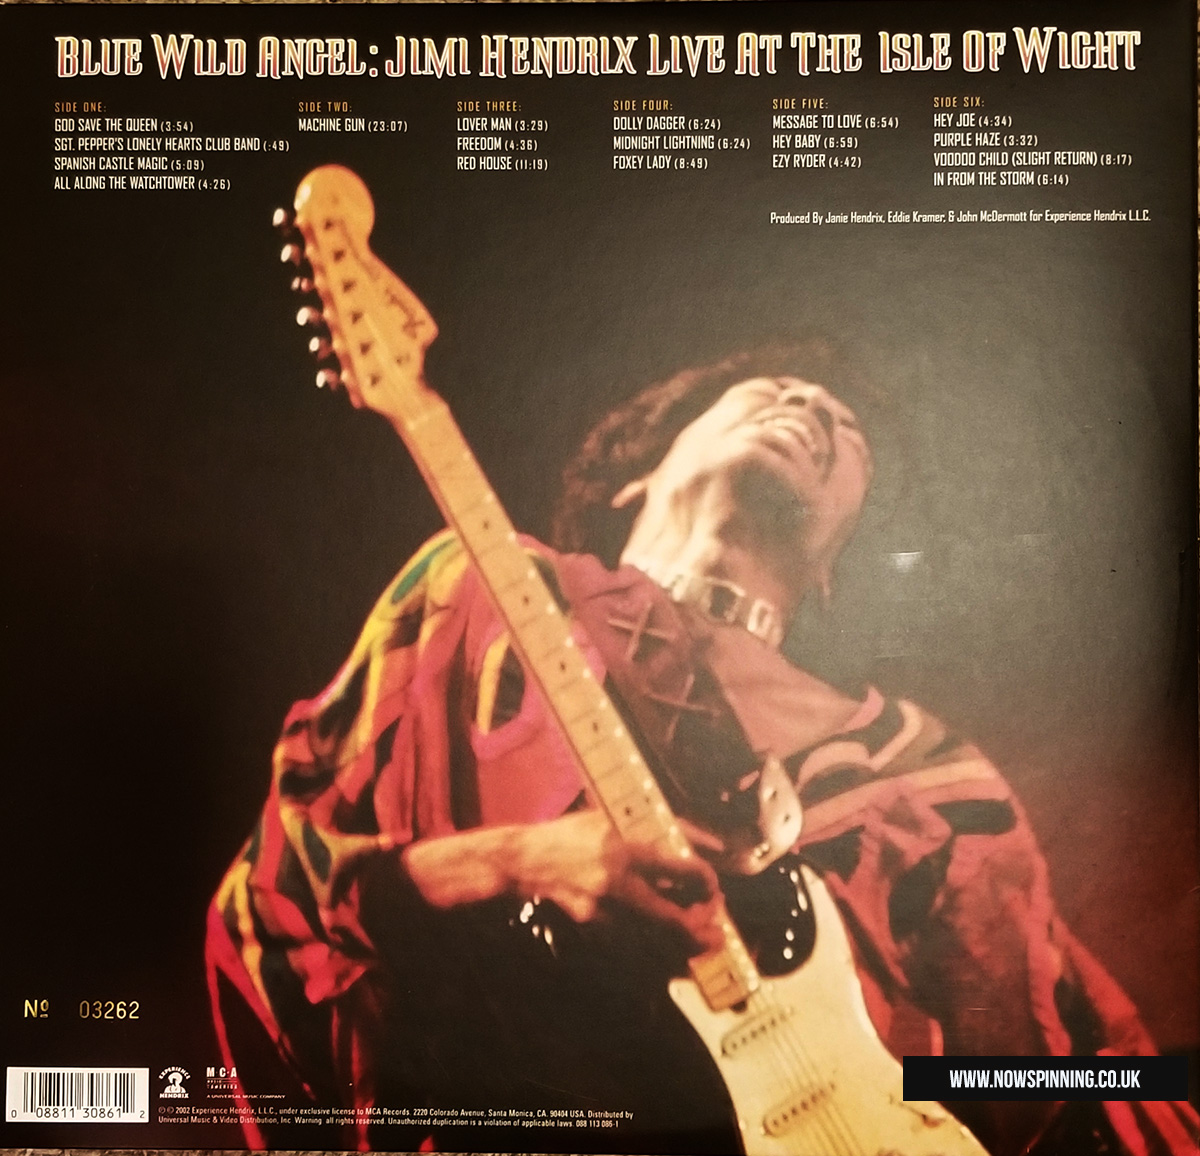 Jimi Hendrix Isle of White Festival Vinyl back cover